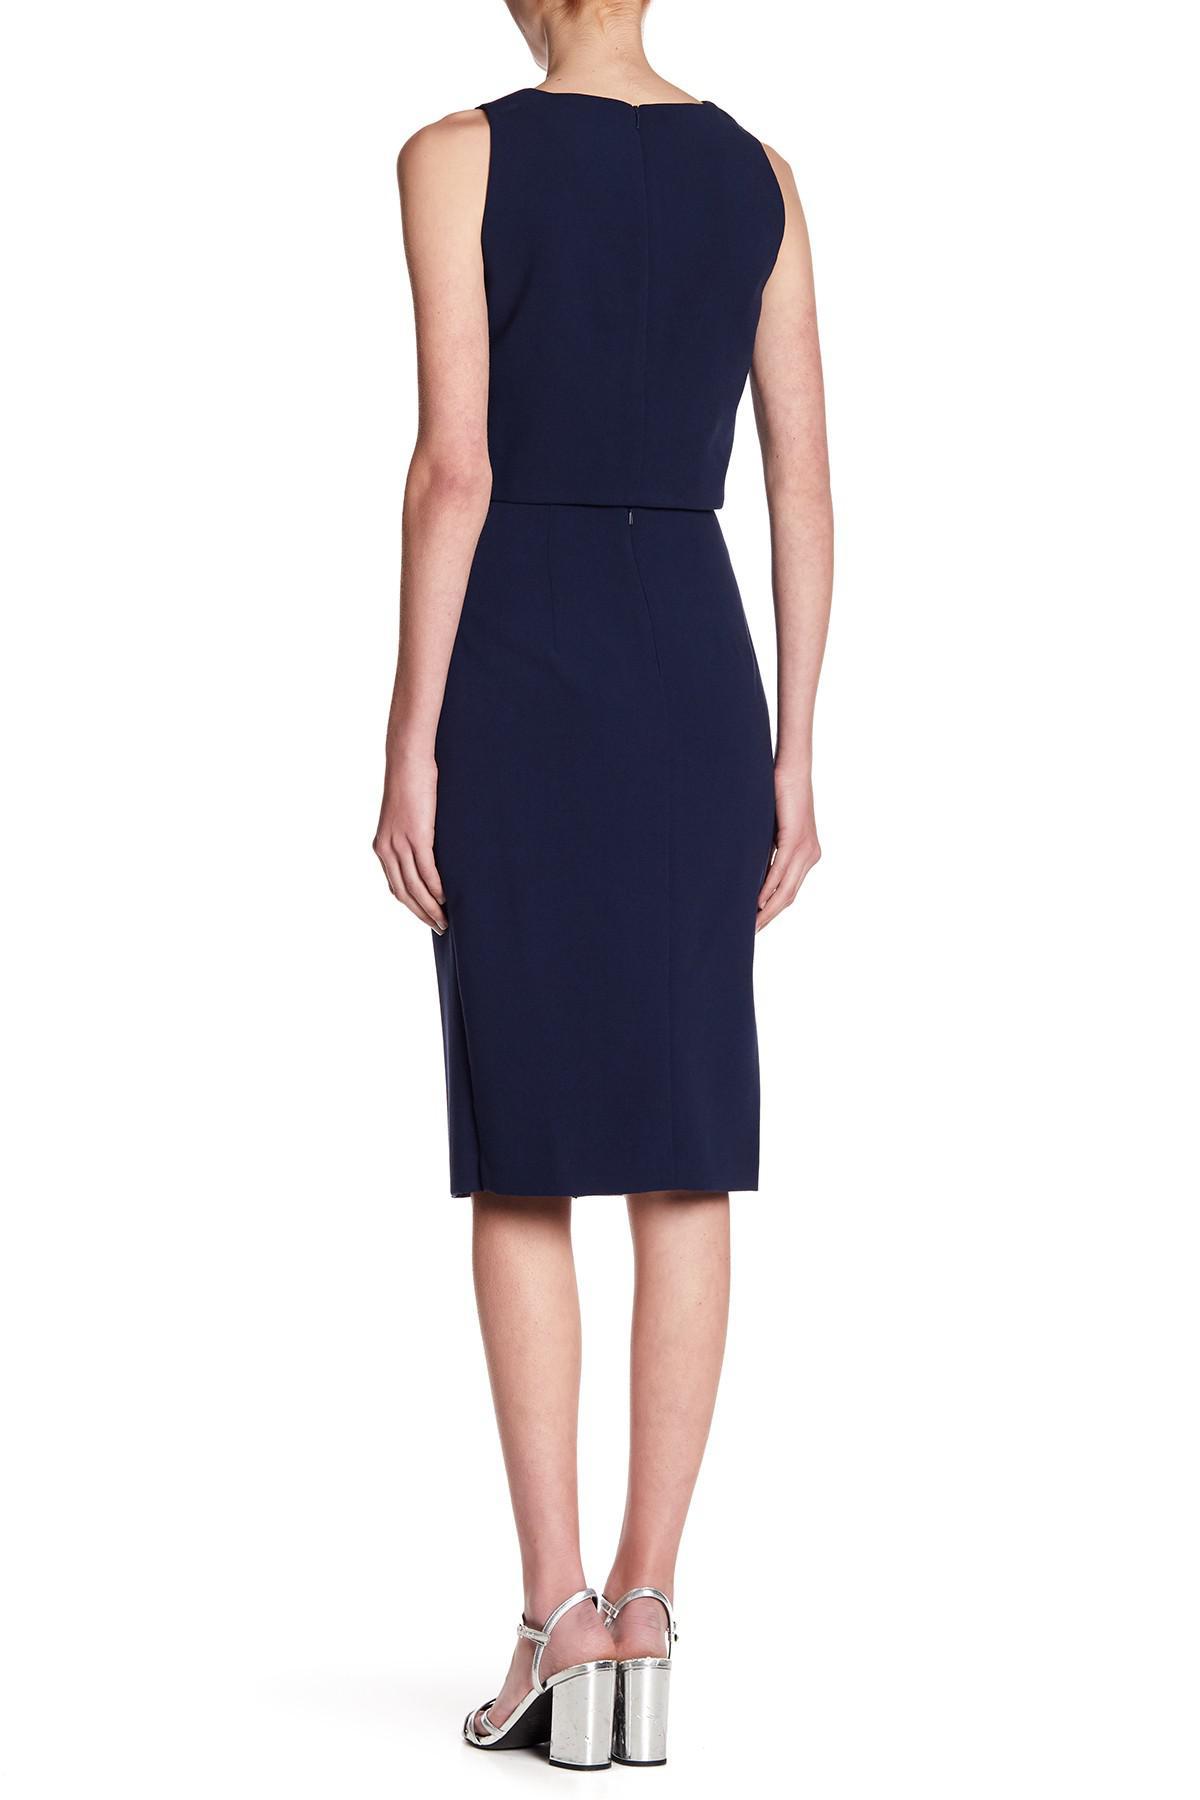 09d91ea5d High Waist Pencil Skirt With Crop Top   Huston Fislar Photography